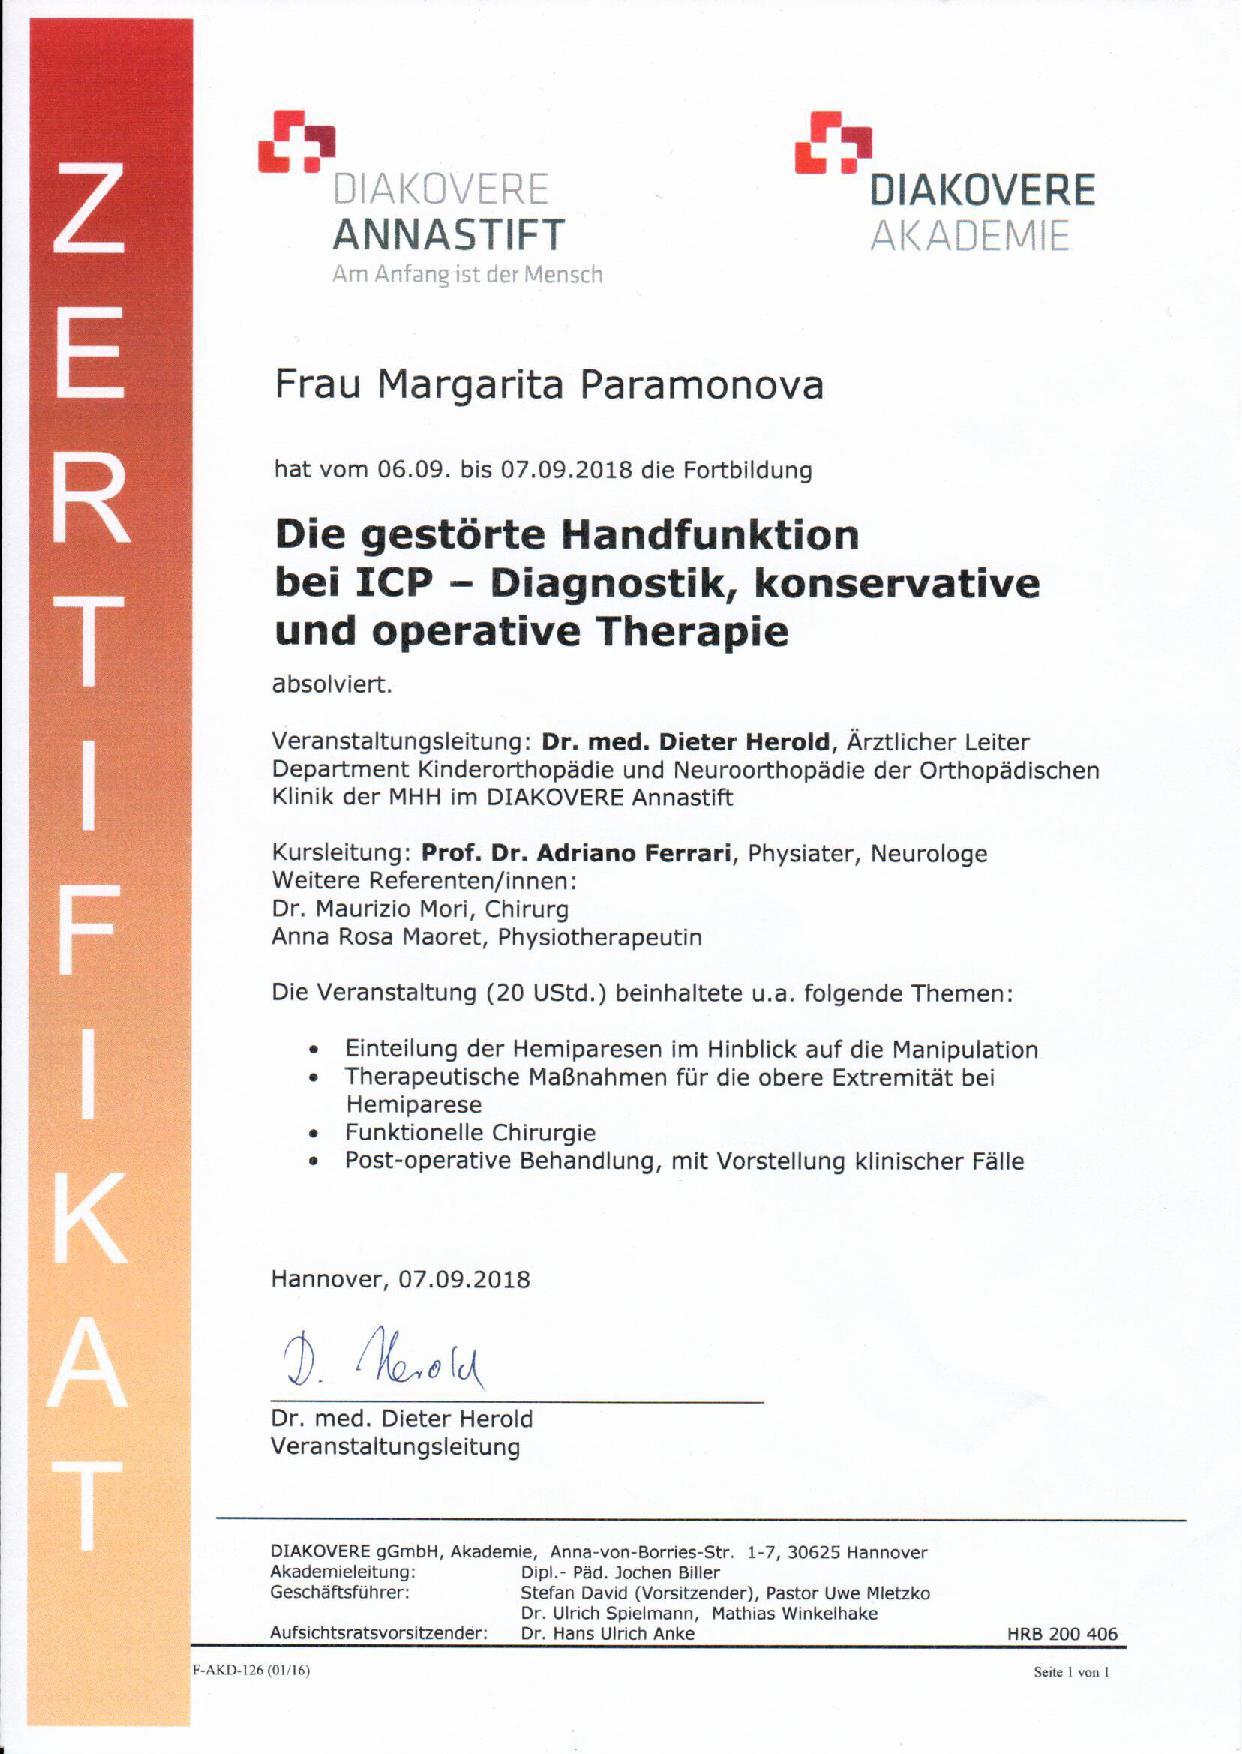 43 Сертификат_09.2018 (1)